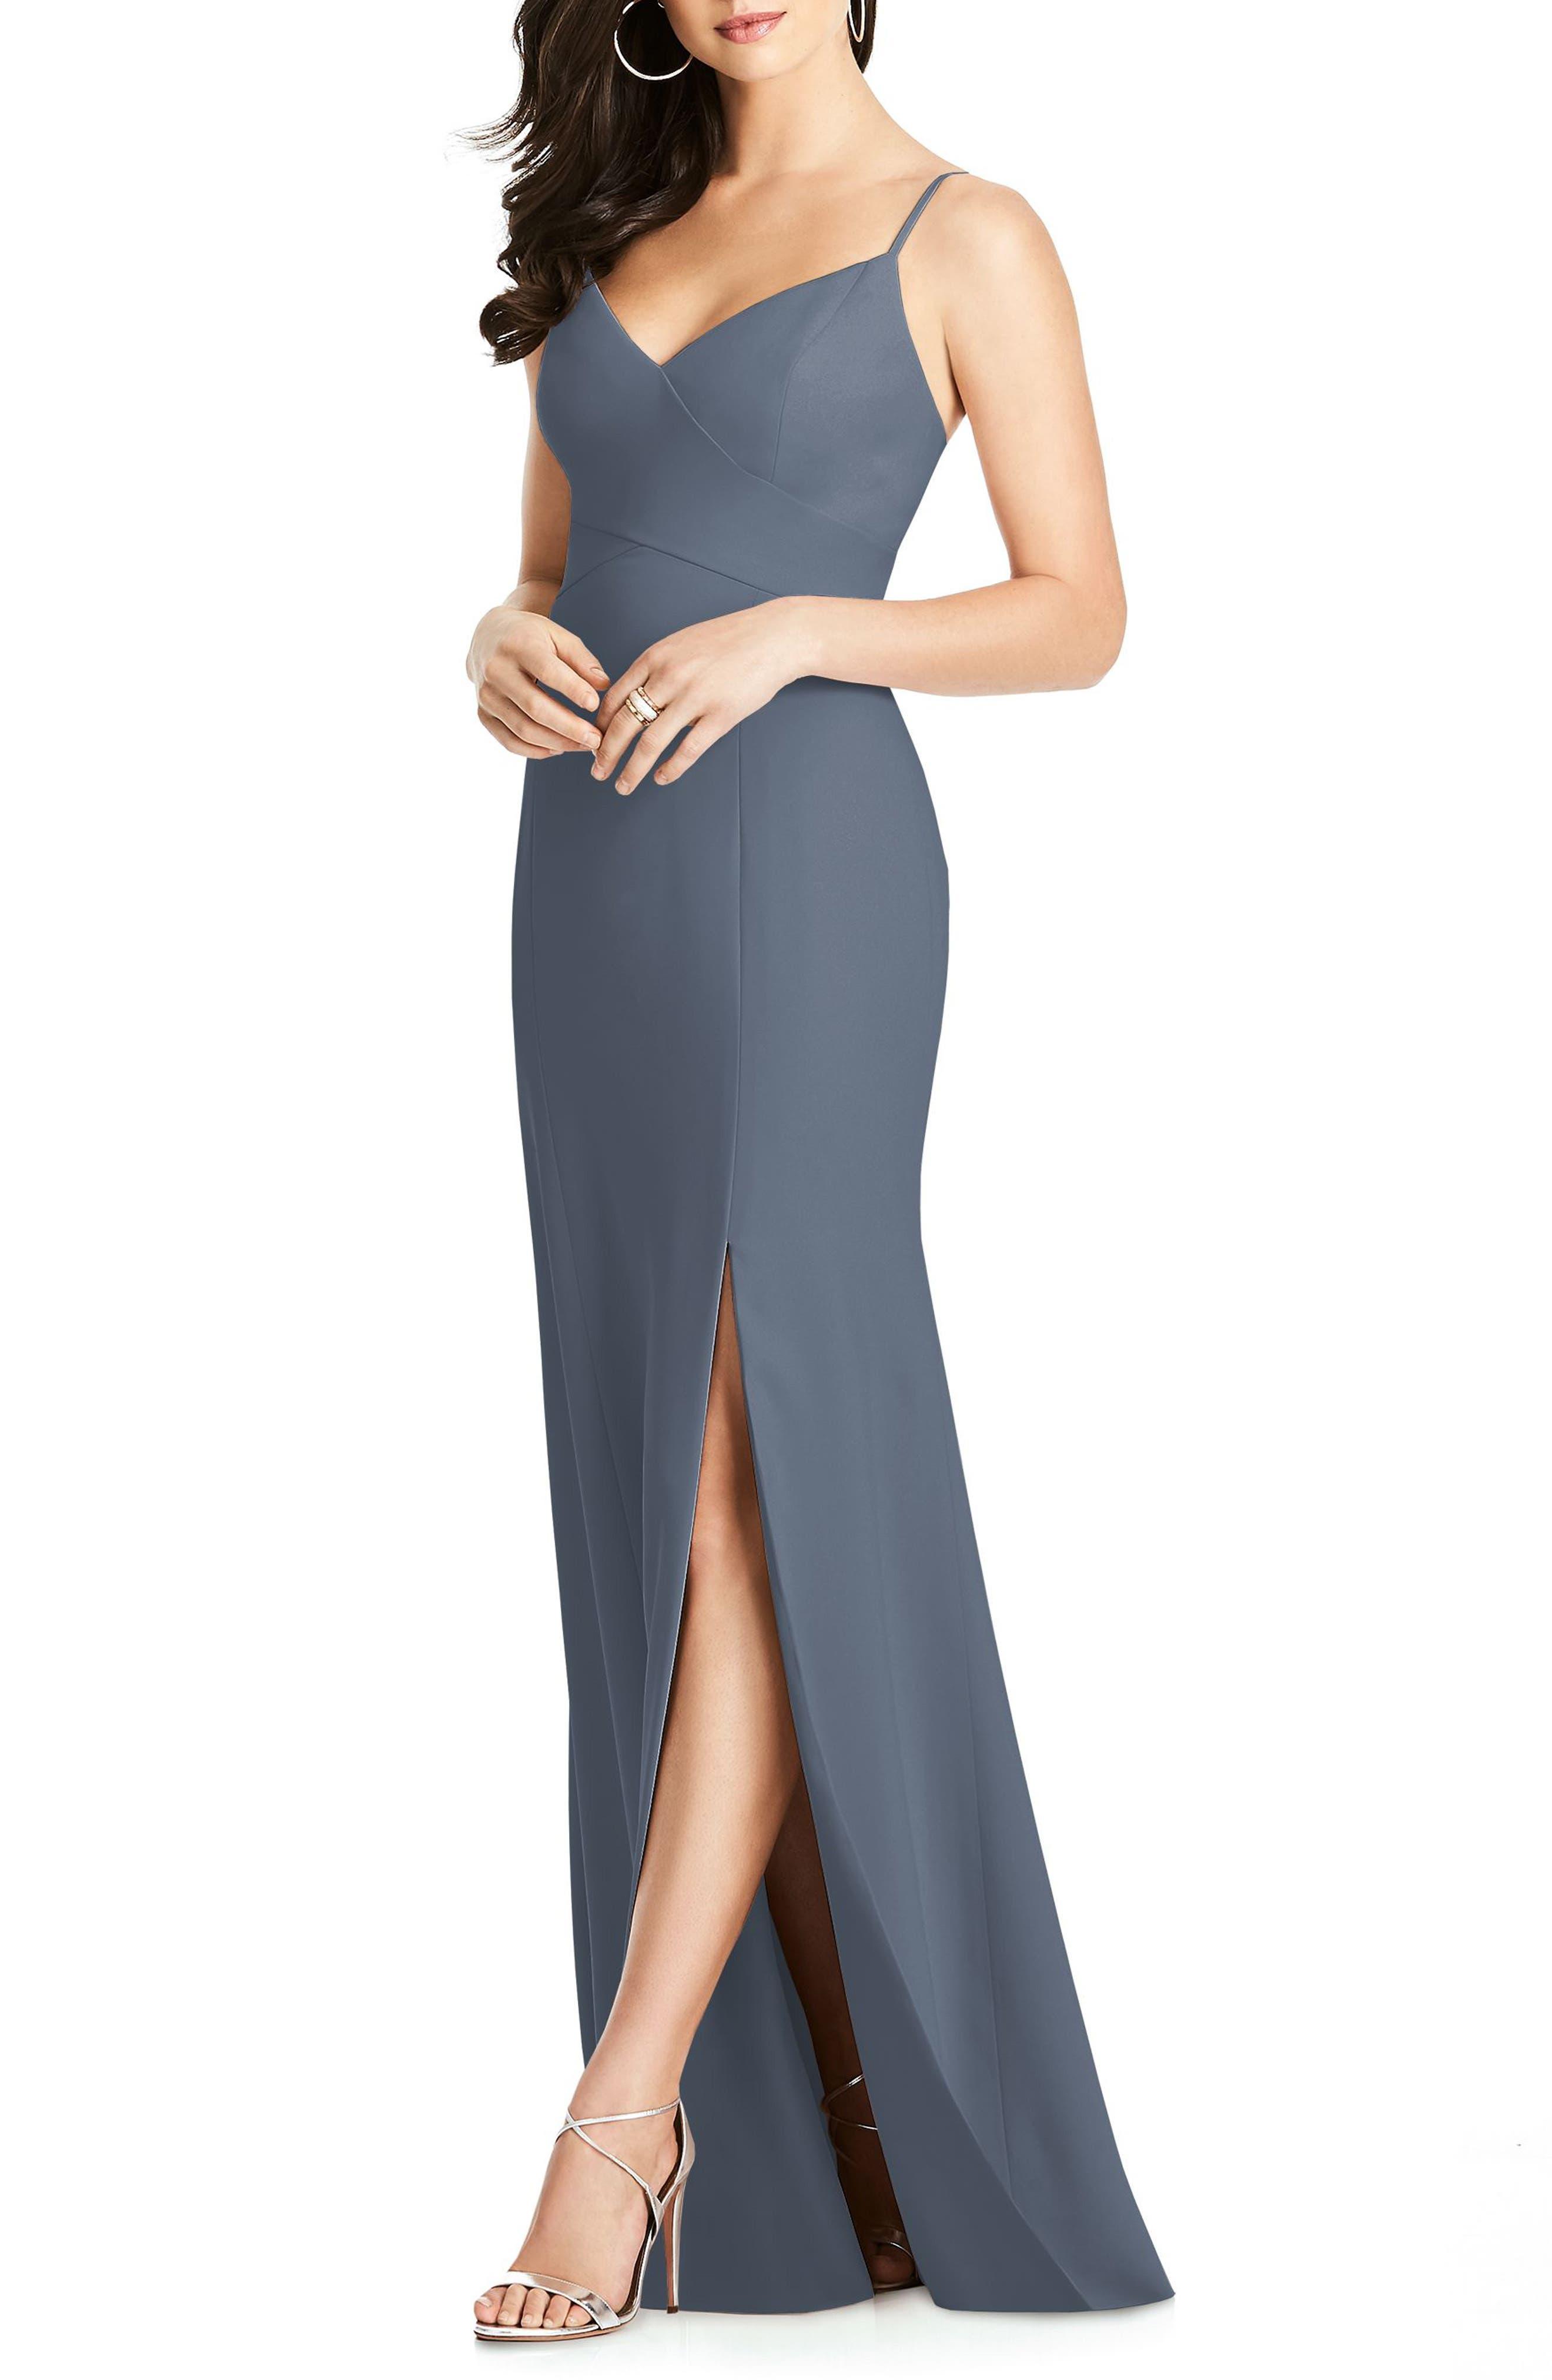 DESSY COLLECTION Crisscross Seam Crepe Gown, Main, color, SILVERSTONE